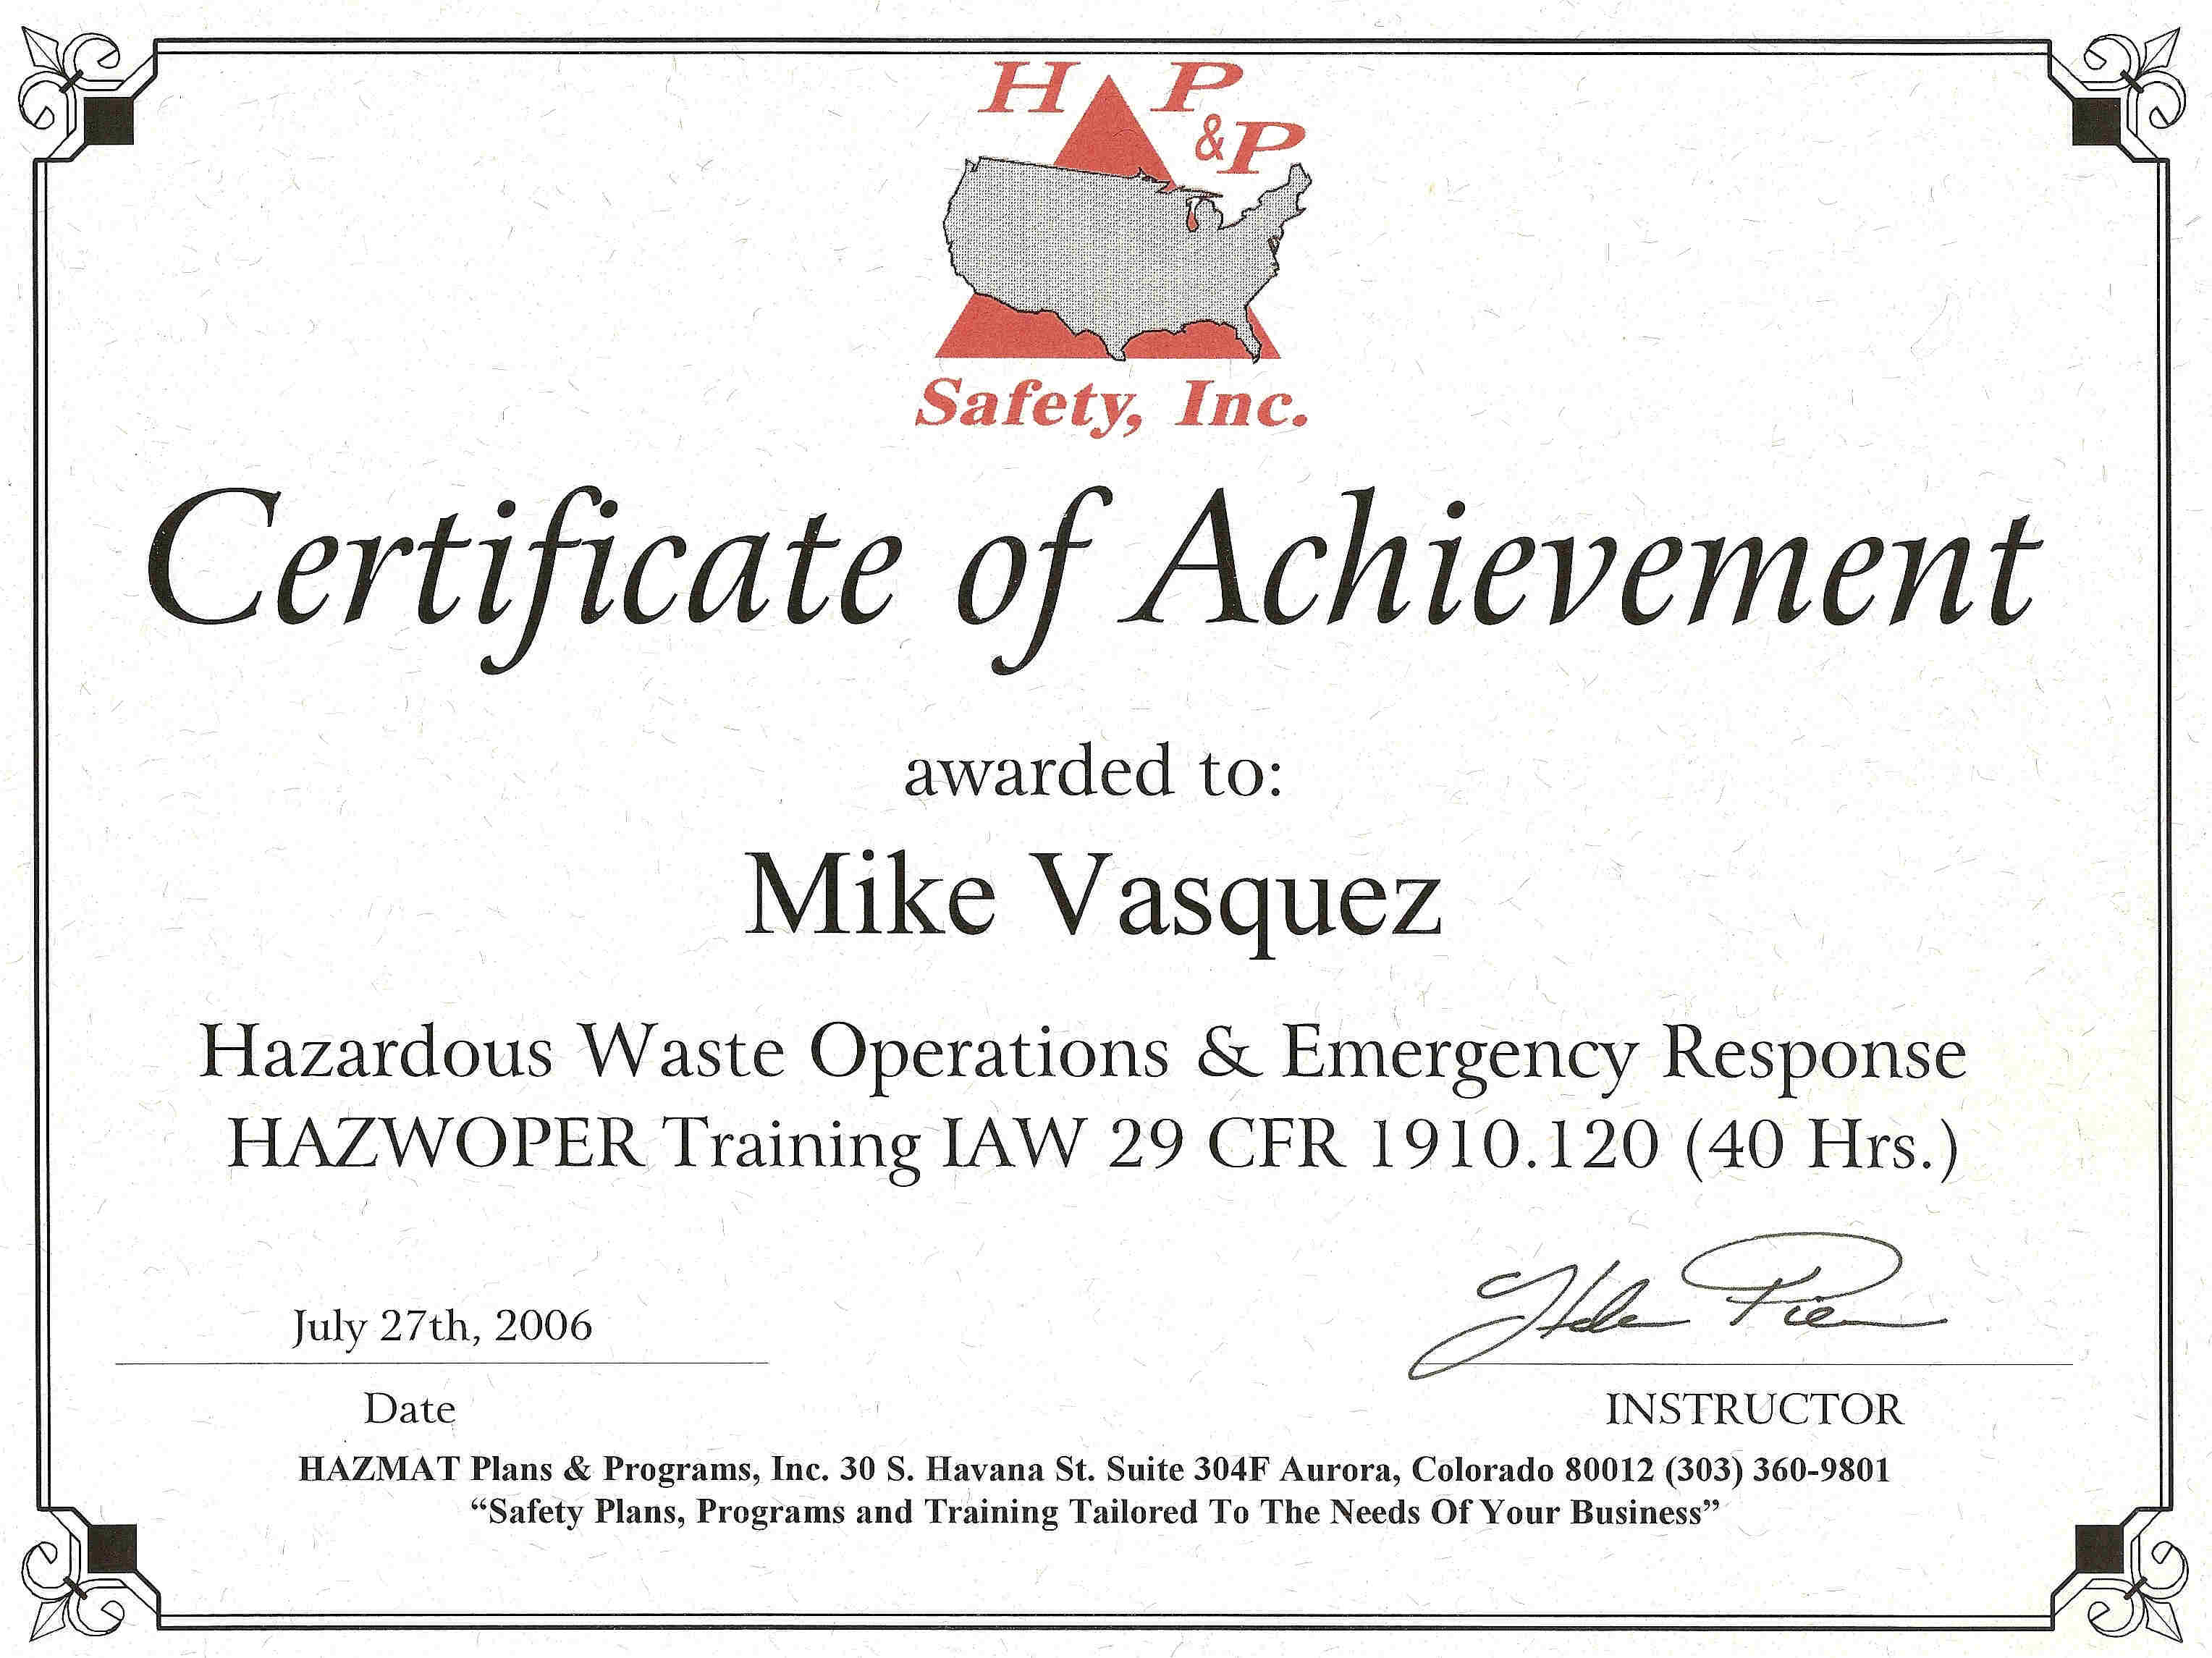 refresher certificates course hazwoper annual shelf topshelf